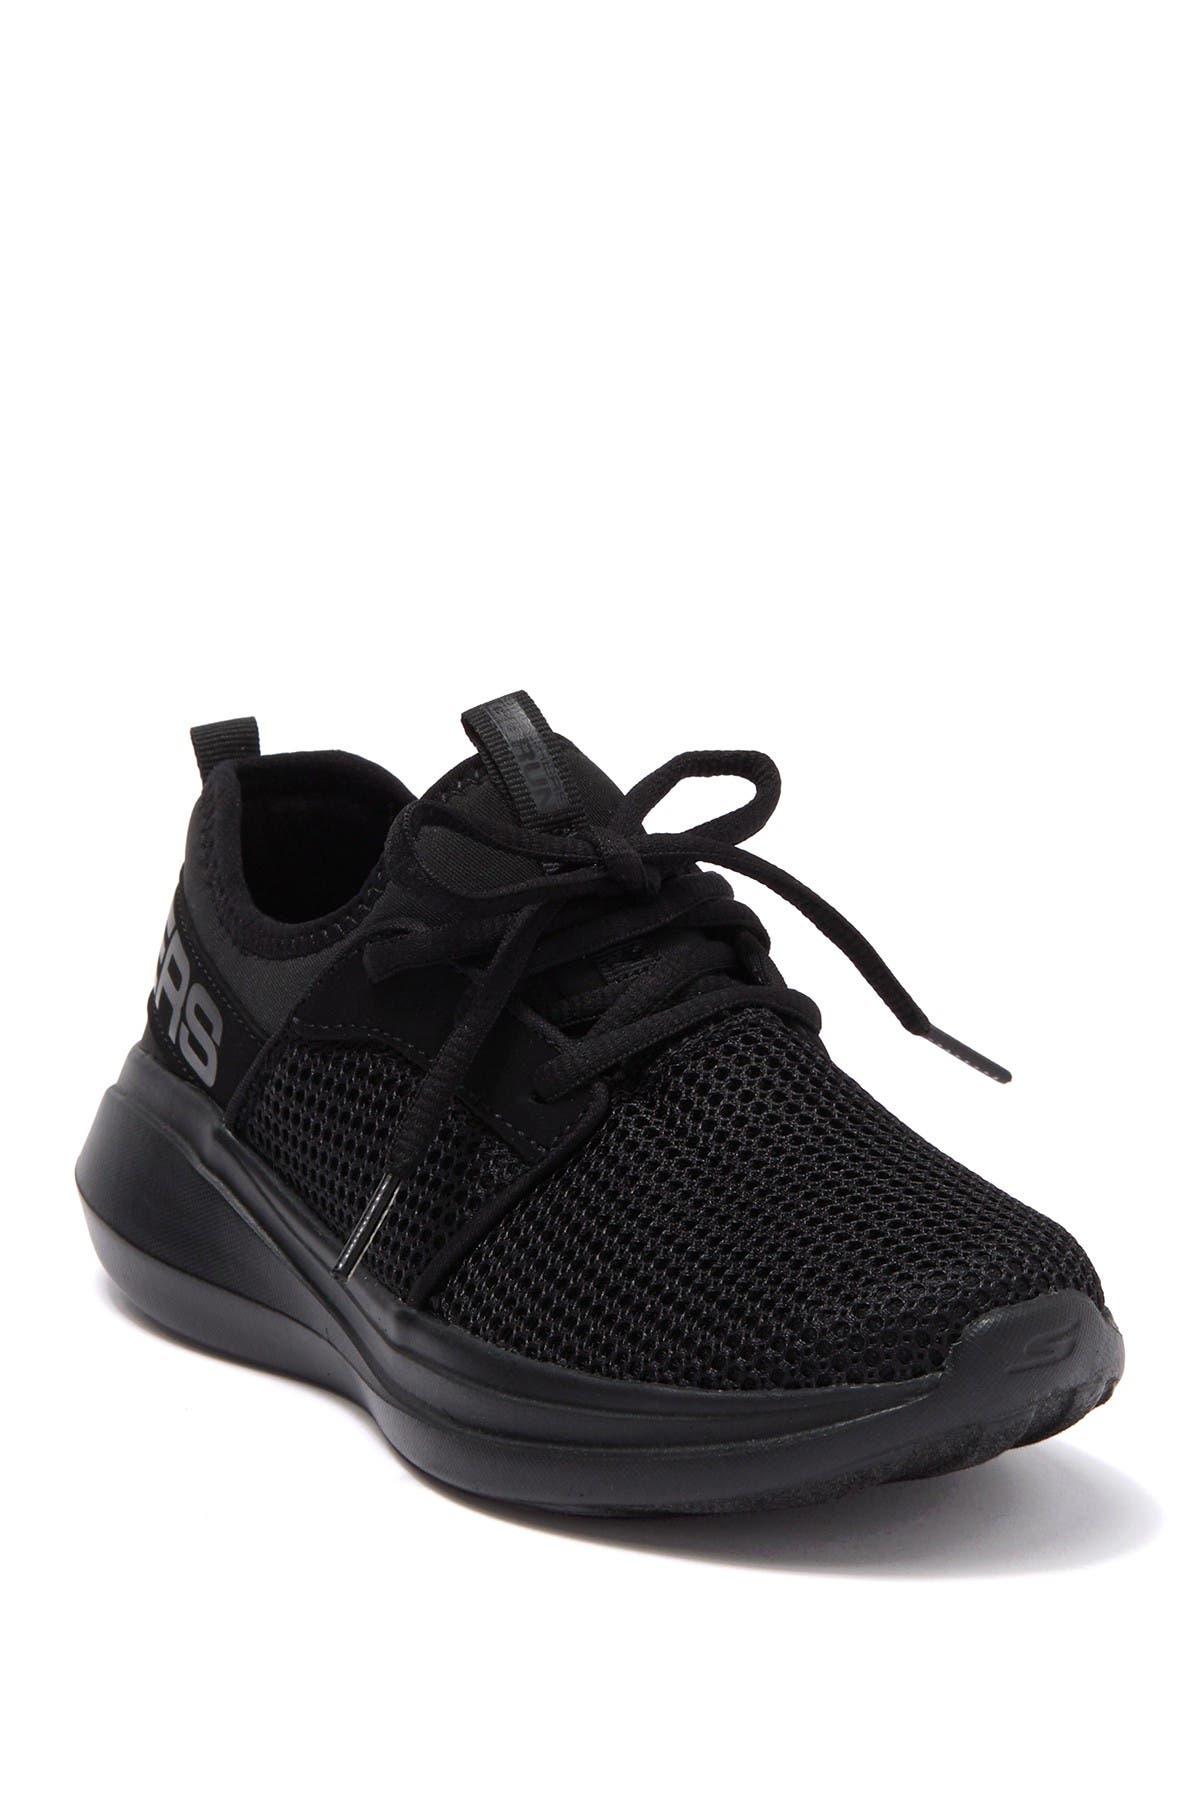 Image of Skechers Go Run Fast Sneaker